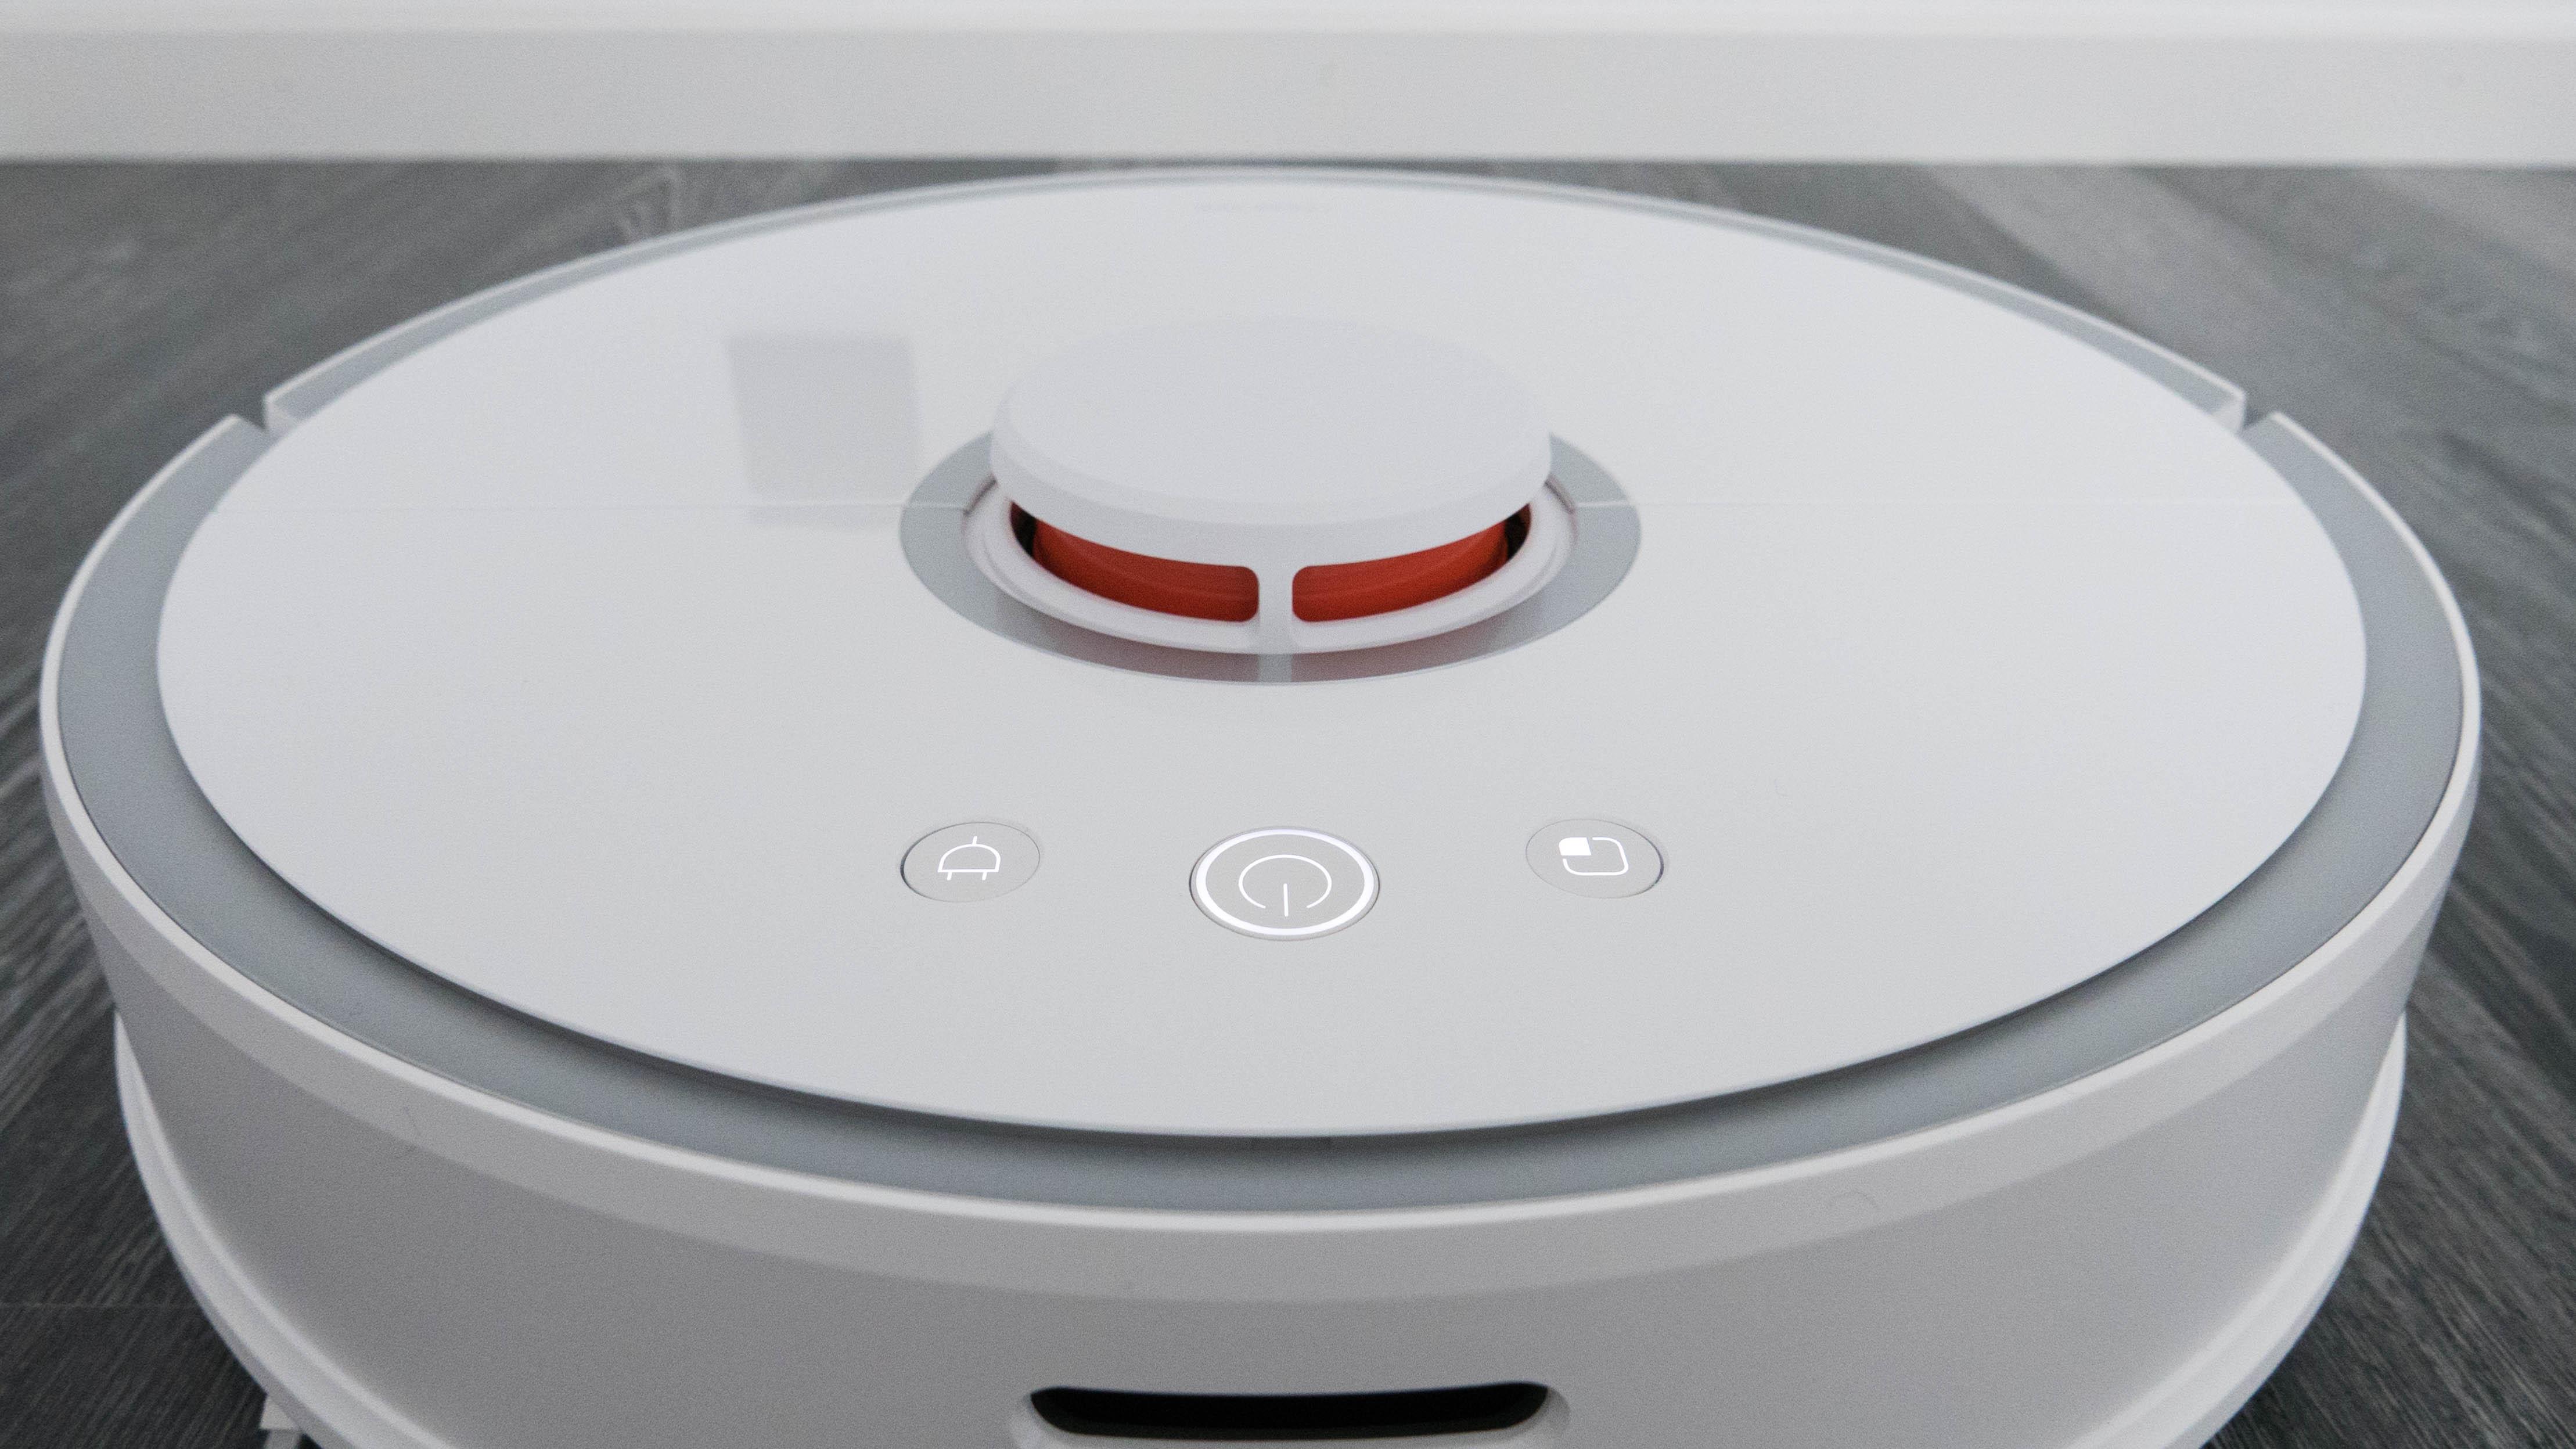 Xiaomi Mi Robot 2 Roborock S50 Roboter Details 17